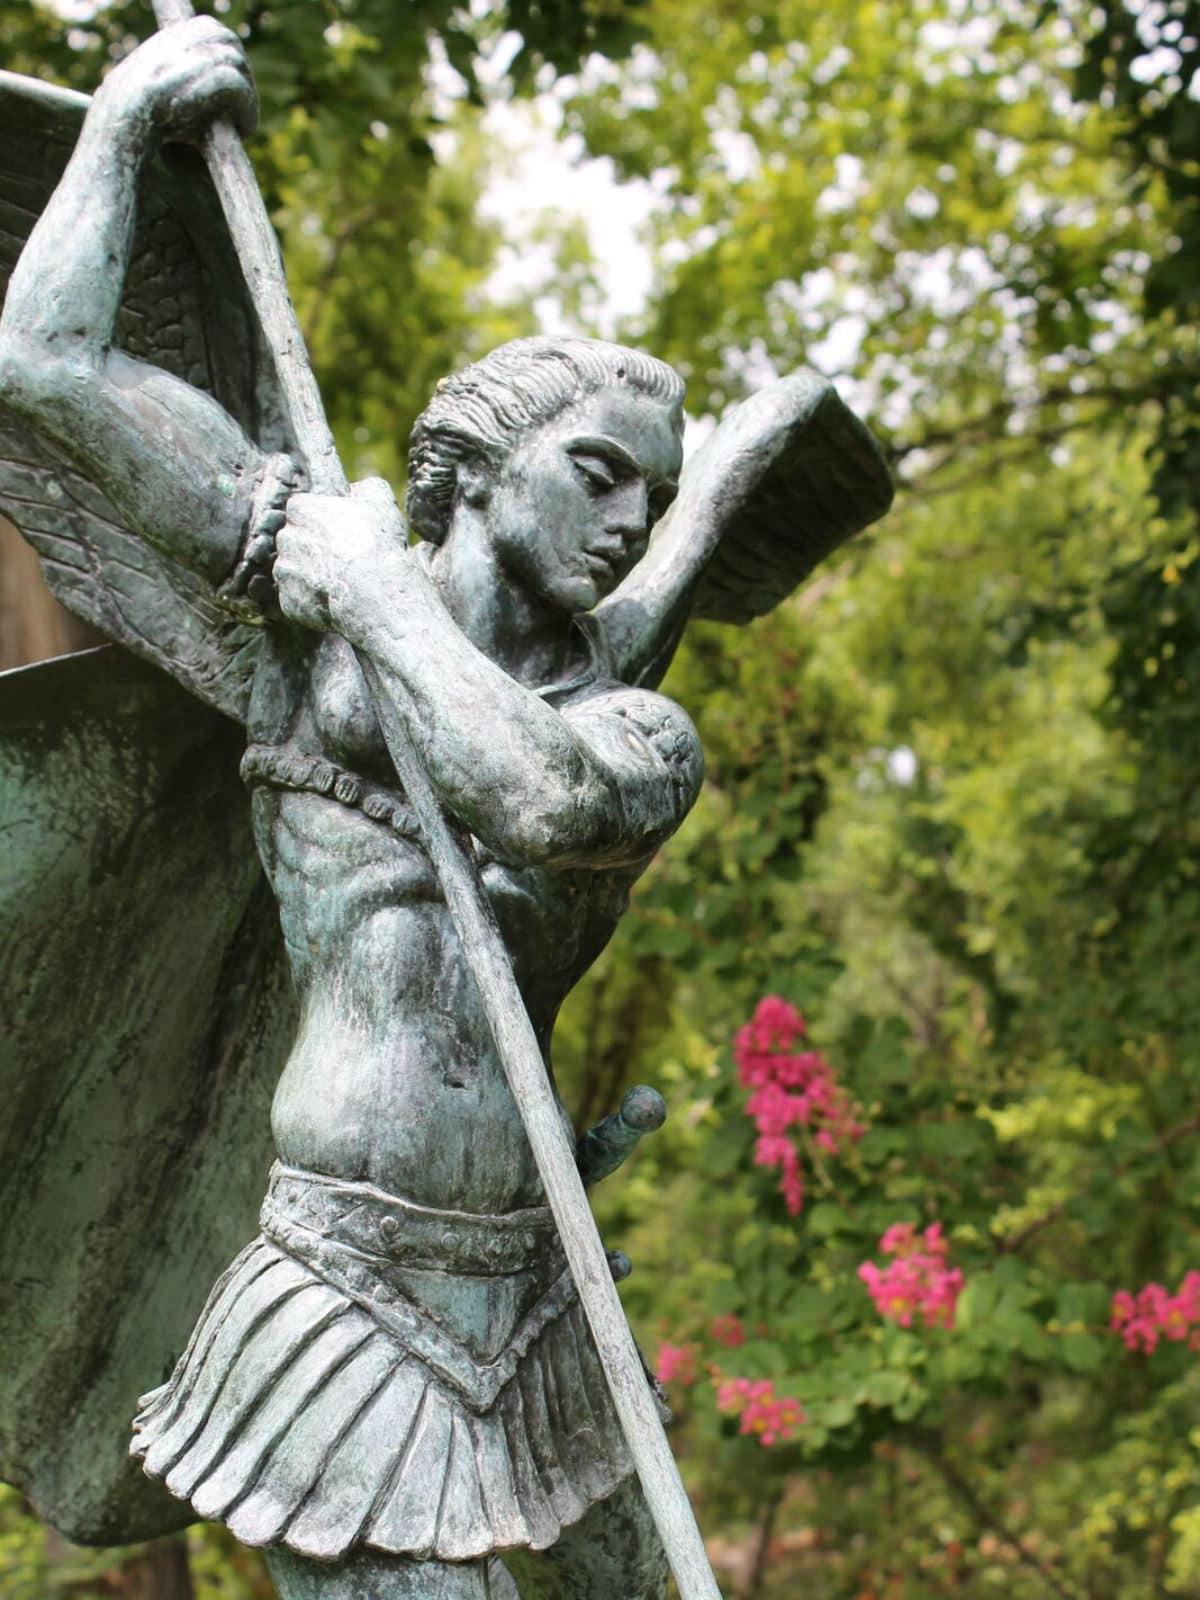 Umlauf Sculpture Garden Museum Presents The Classical Garden Event Culturemap Austin